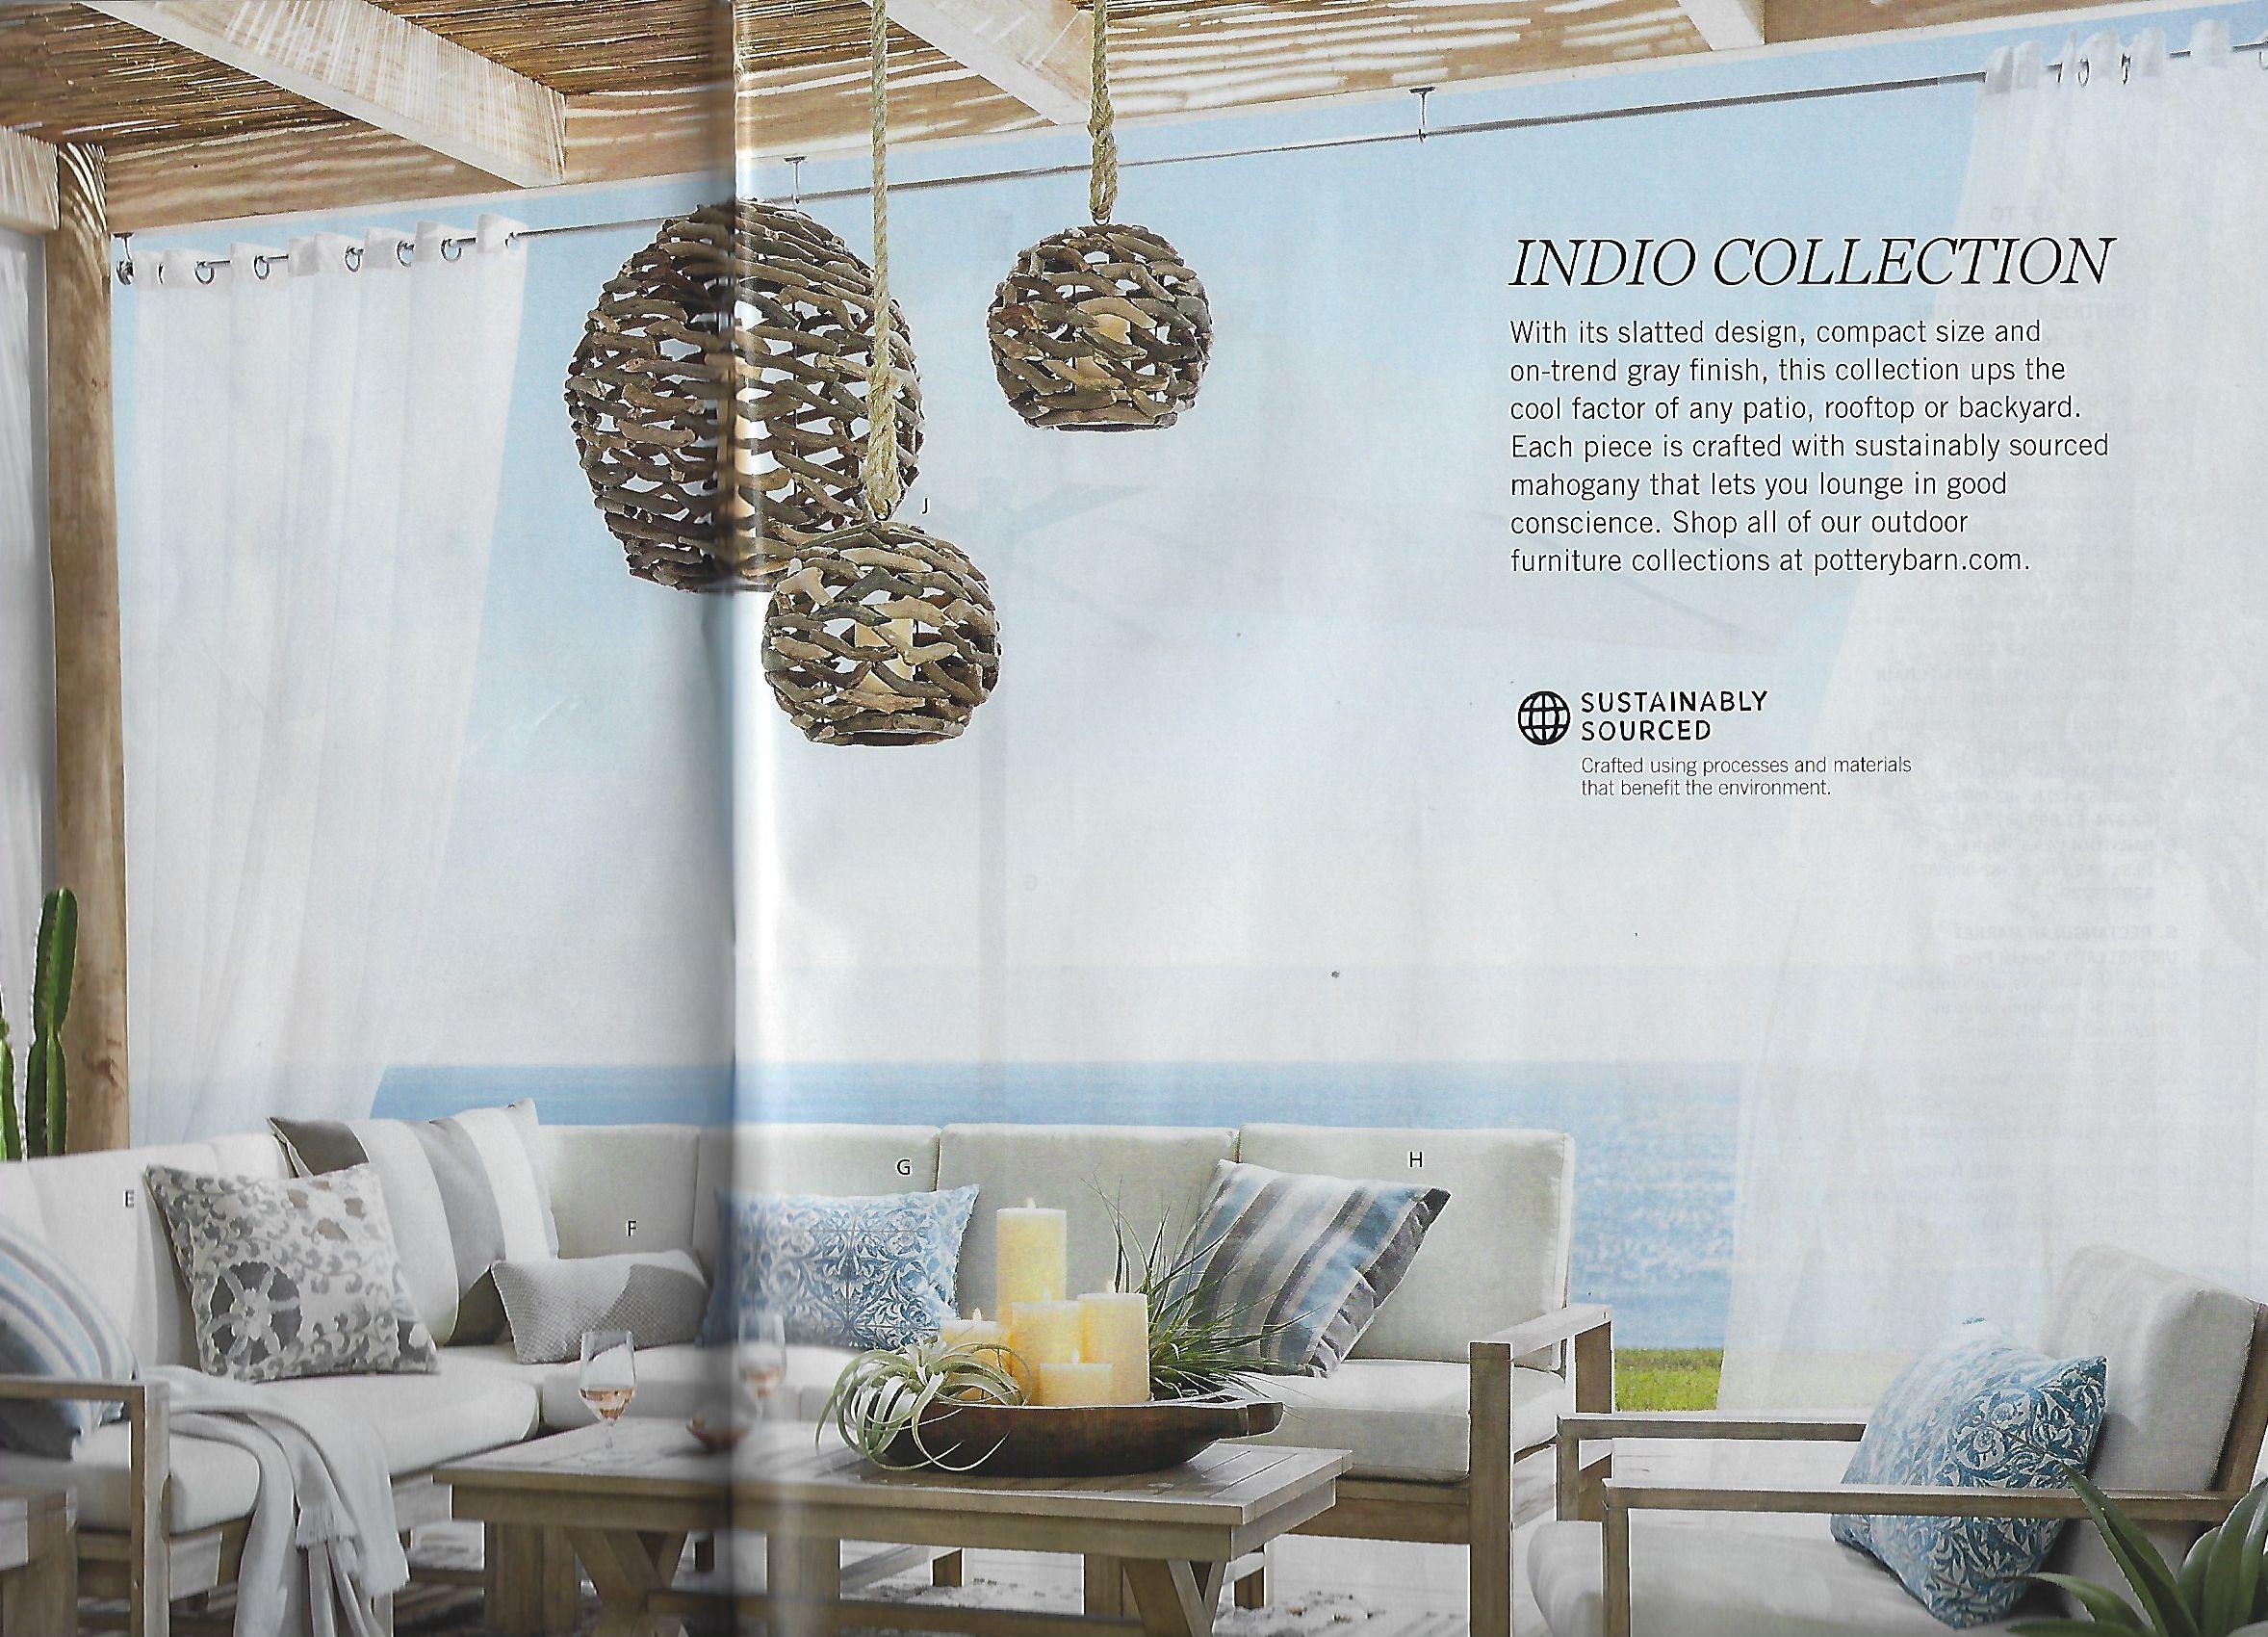 Pergola Outdoor Bamboo Roll Shade Cover Curtain Rod Idea